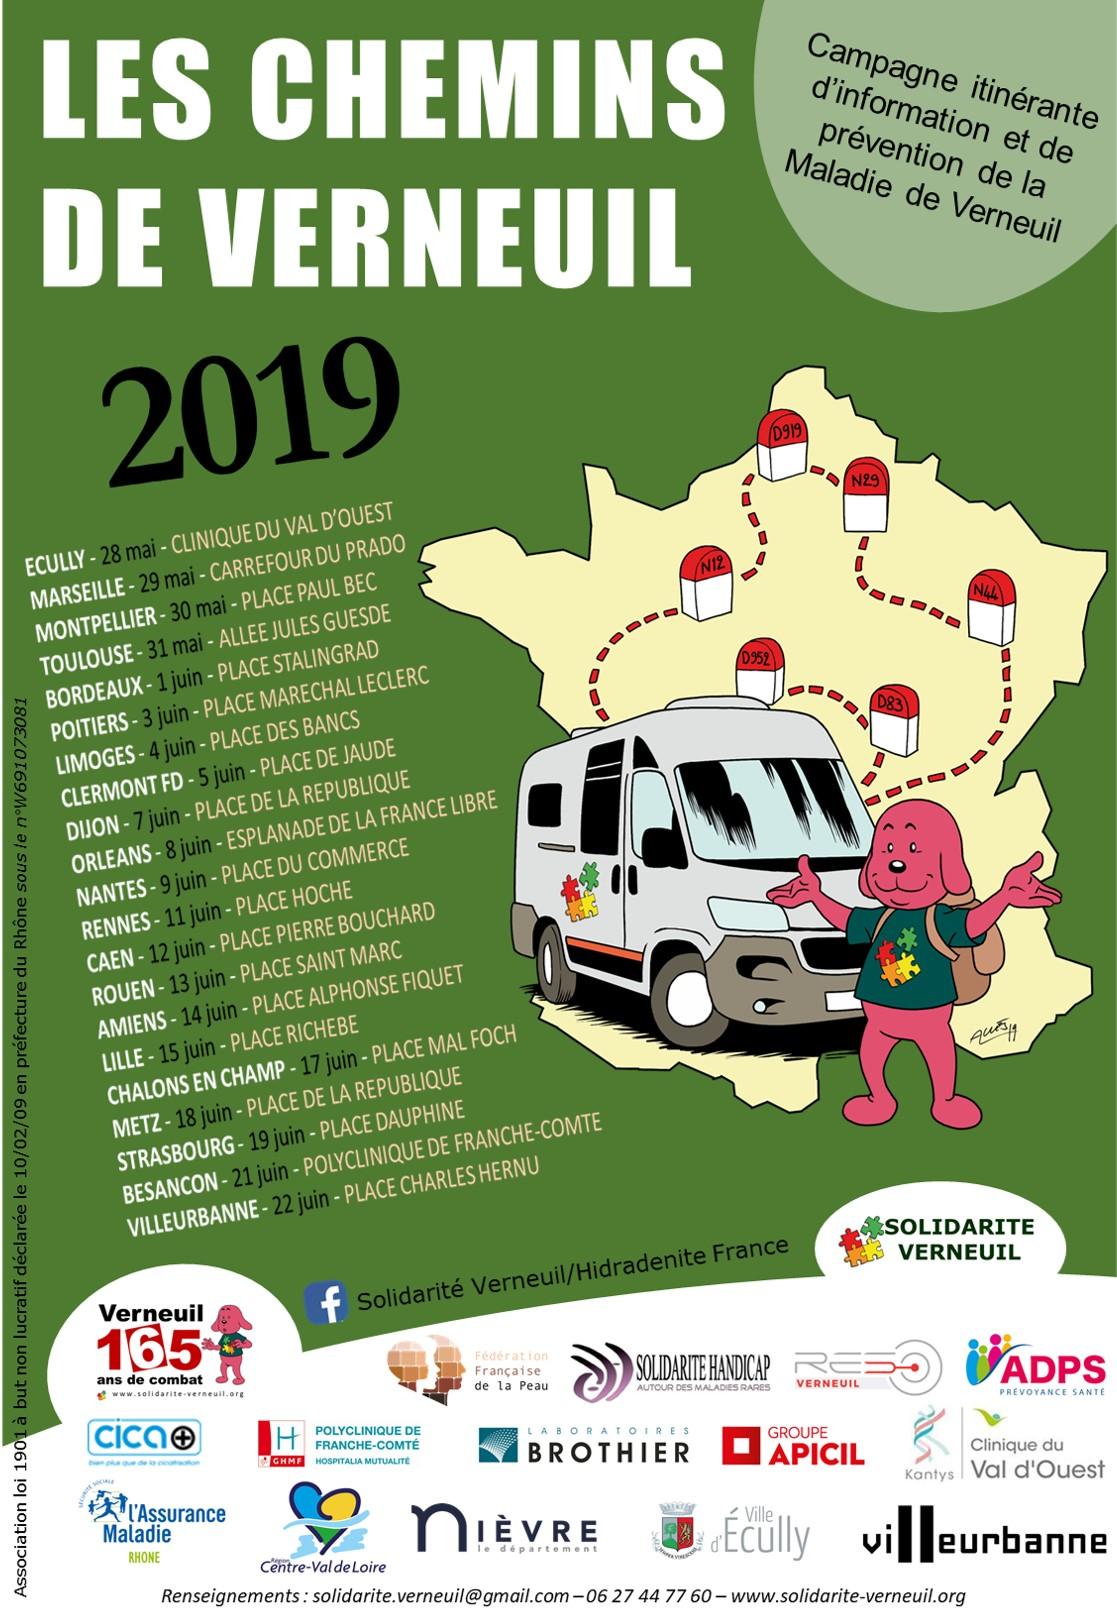 chemin-de-verneuil-2019-maladie-de-verneuil